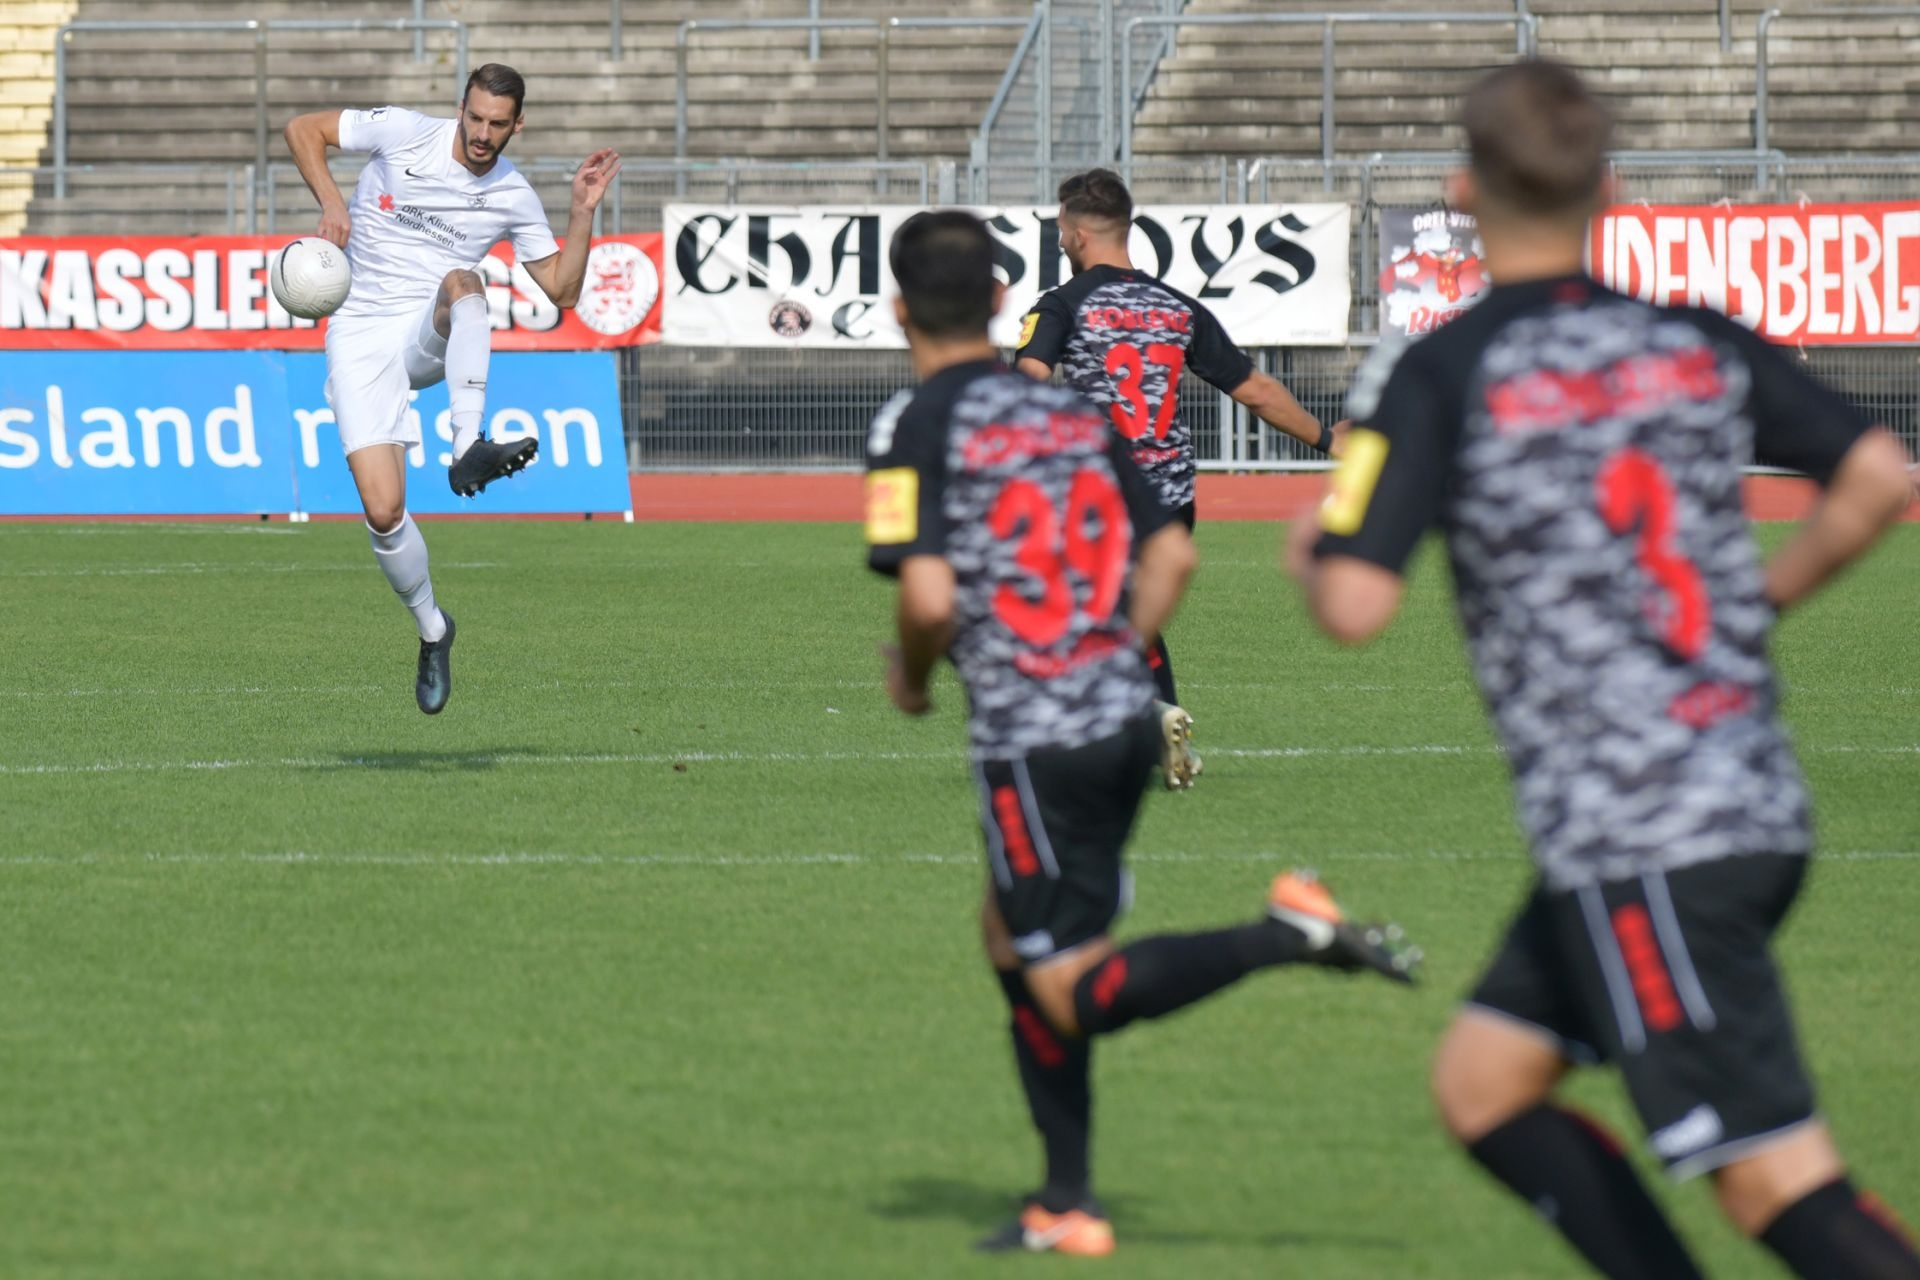 Regionalliga Südwest 2020/21, KSV Hessen Kassel, Rot-Weiss-Koblenz, Endstand 1:1, Kevin Nennhuber